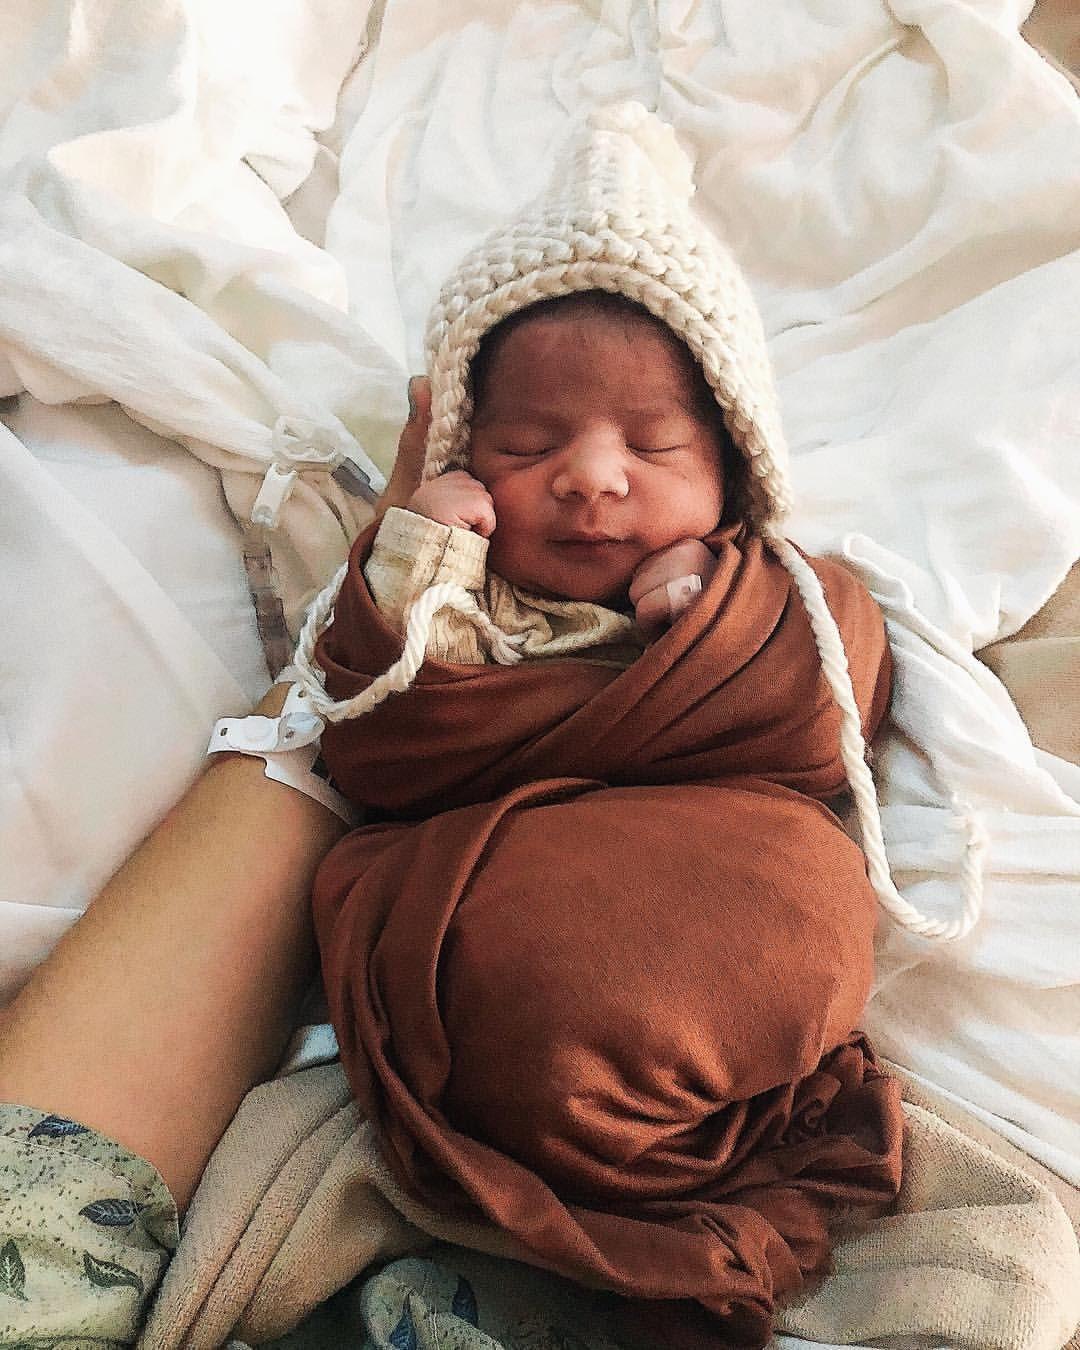 Newborn baby fall baby inspired photos newborn photos taken at the hospital 🍂✨🌻 newborn baby babyphotos